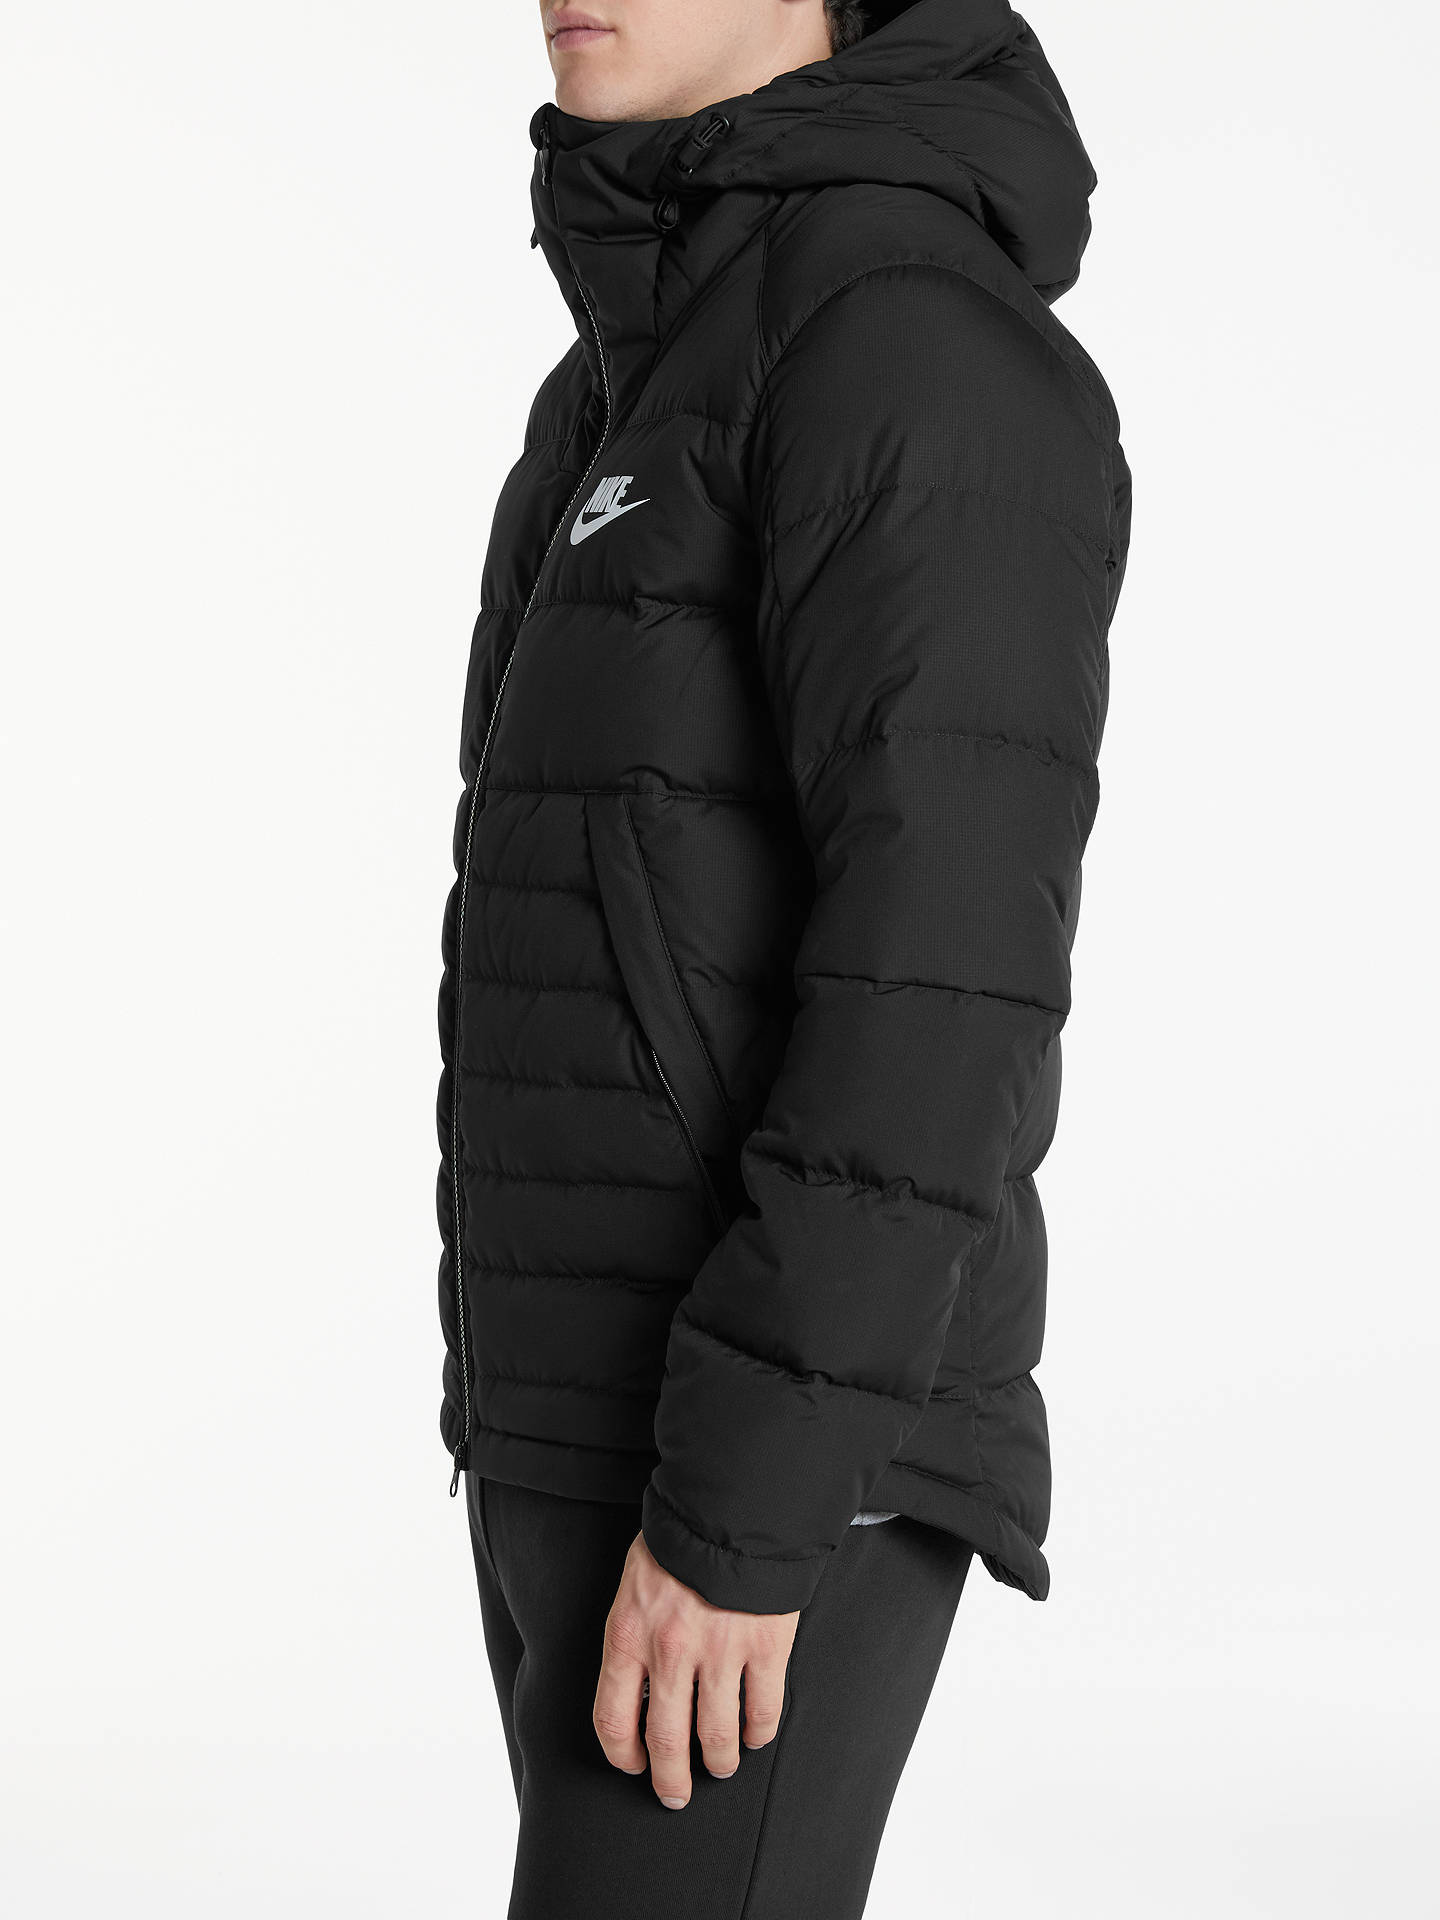 6c97b1306 Nike Sportswear Down Insulated Jacket, Black at John Lewis & Partners